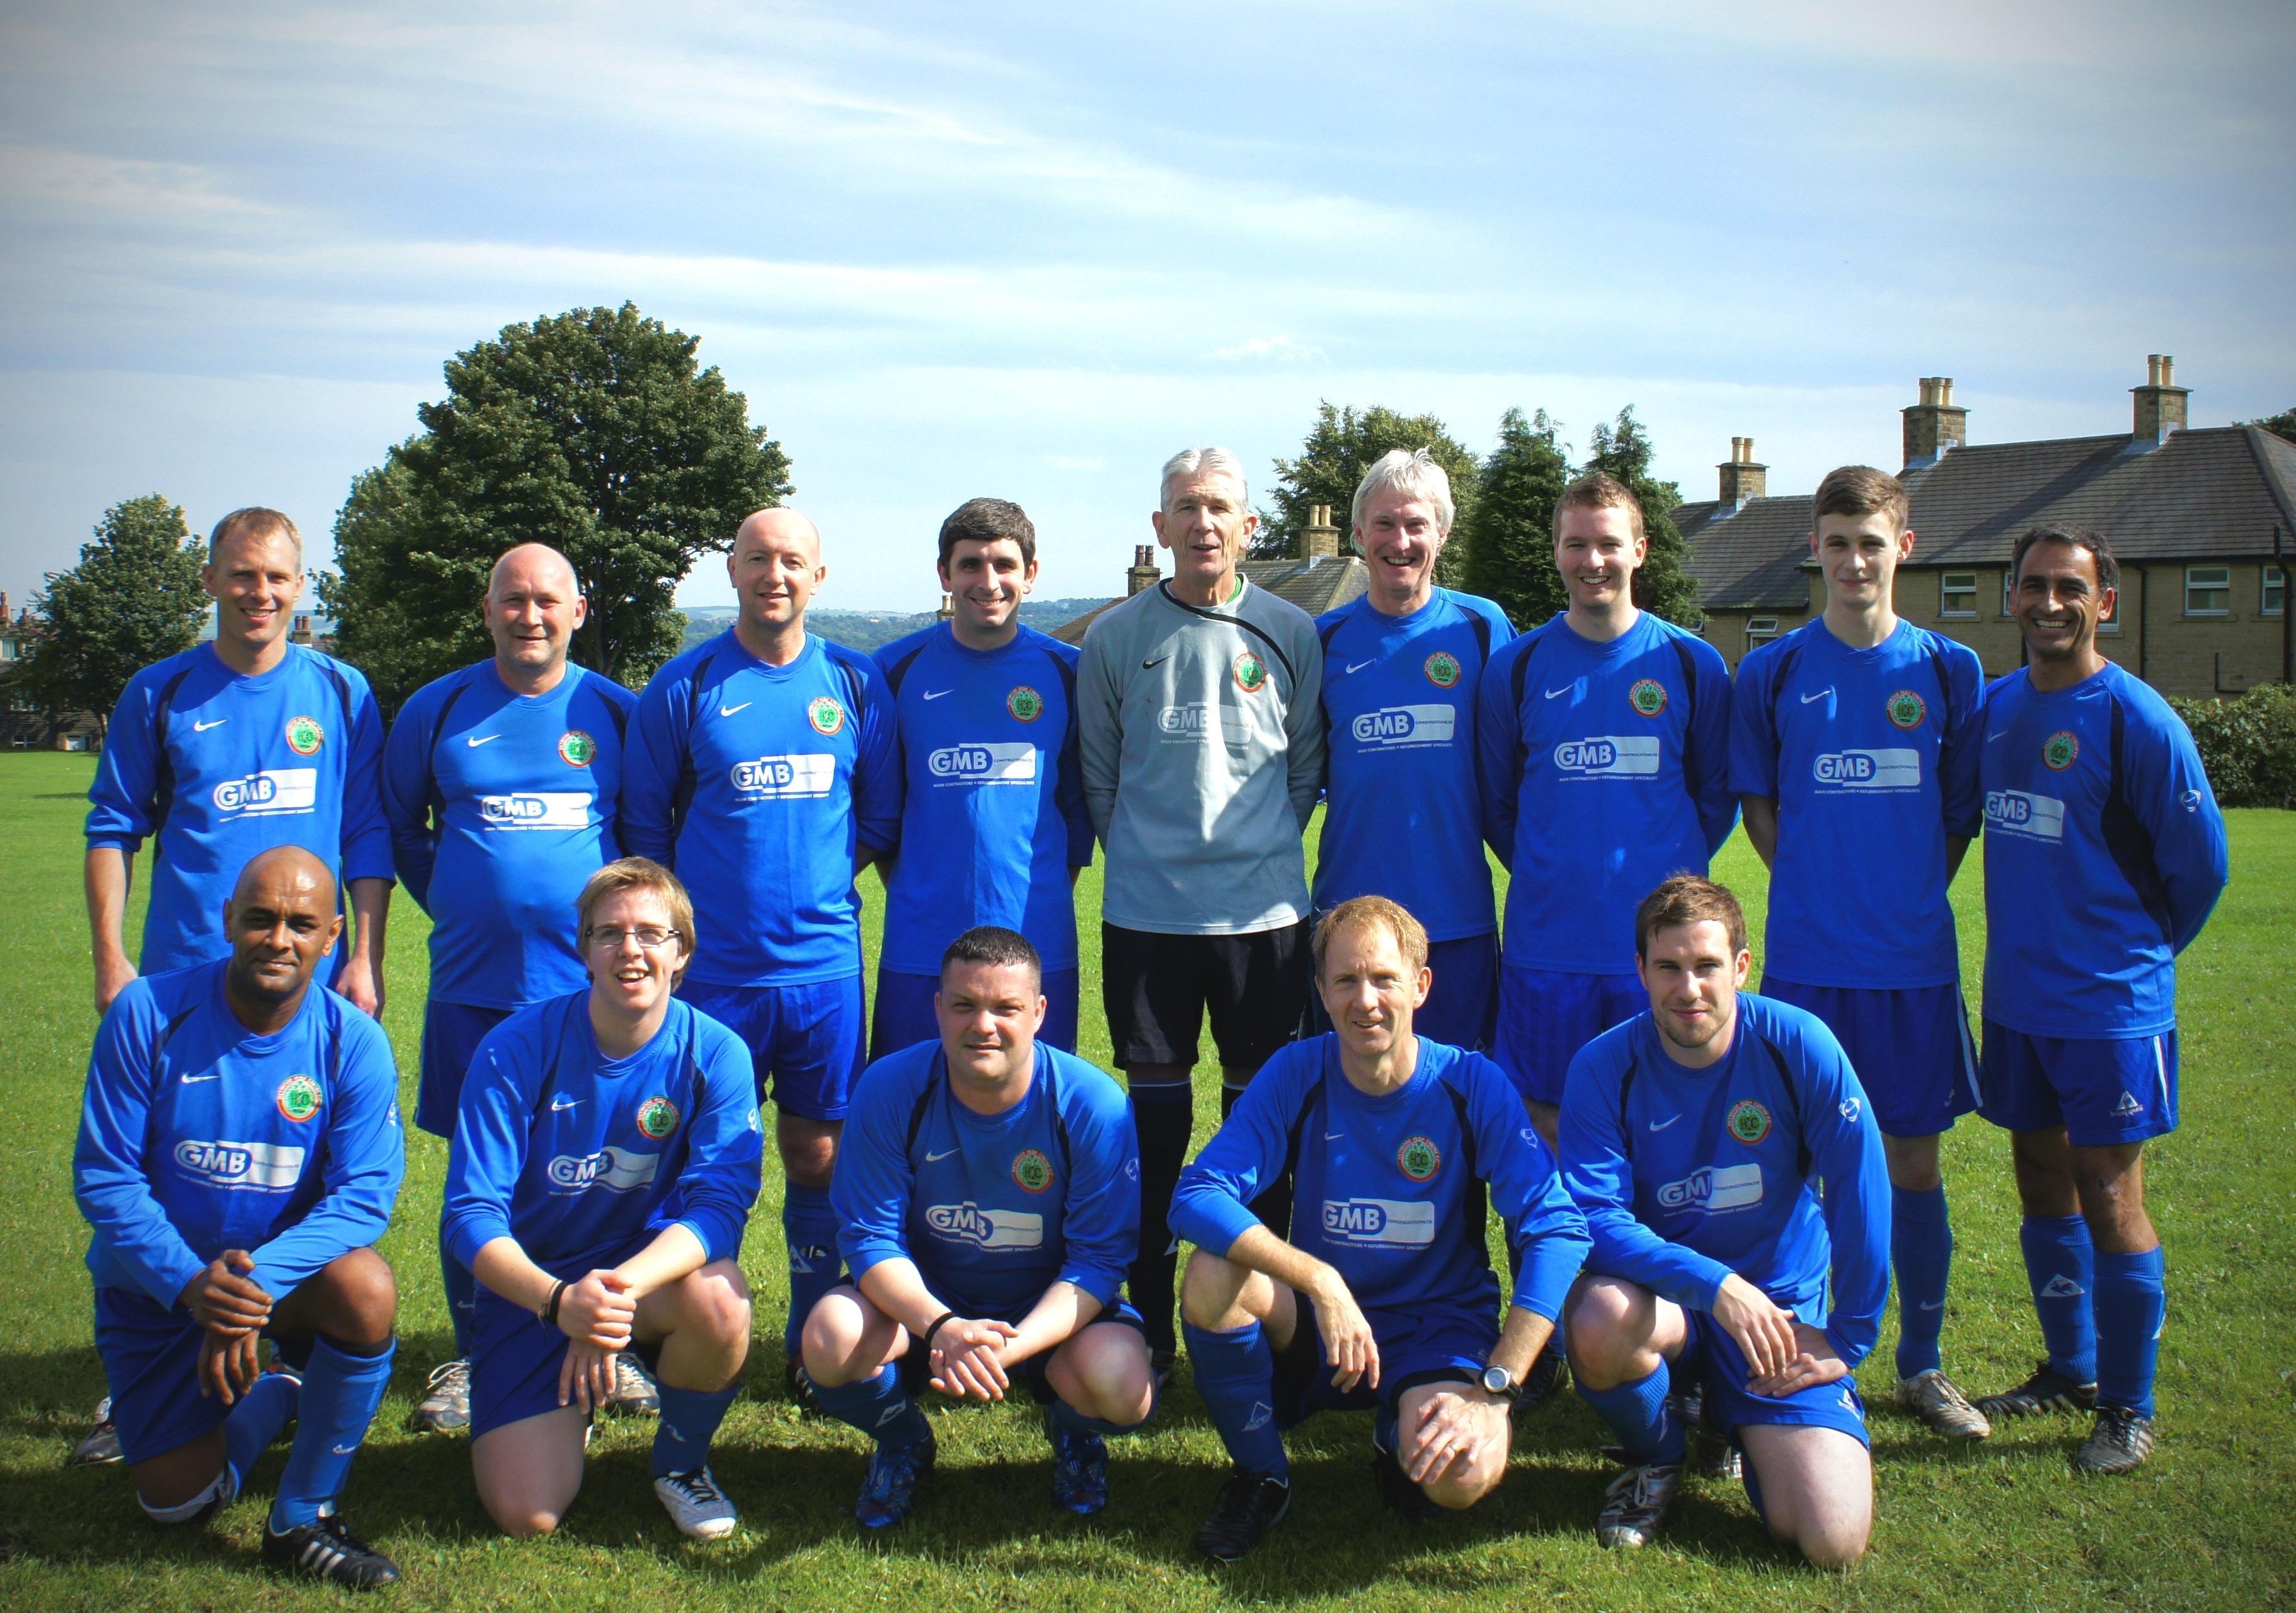 Bon Ellis Furniture Charity Football Match Winning Team The Office Coats.